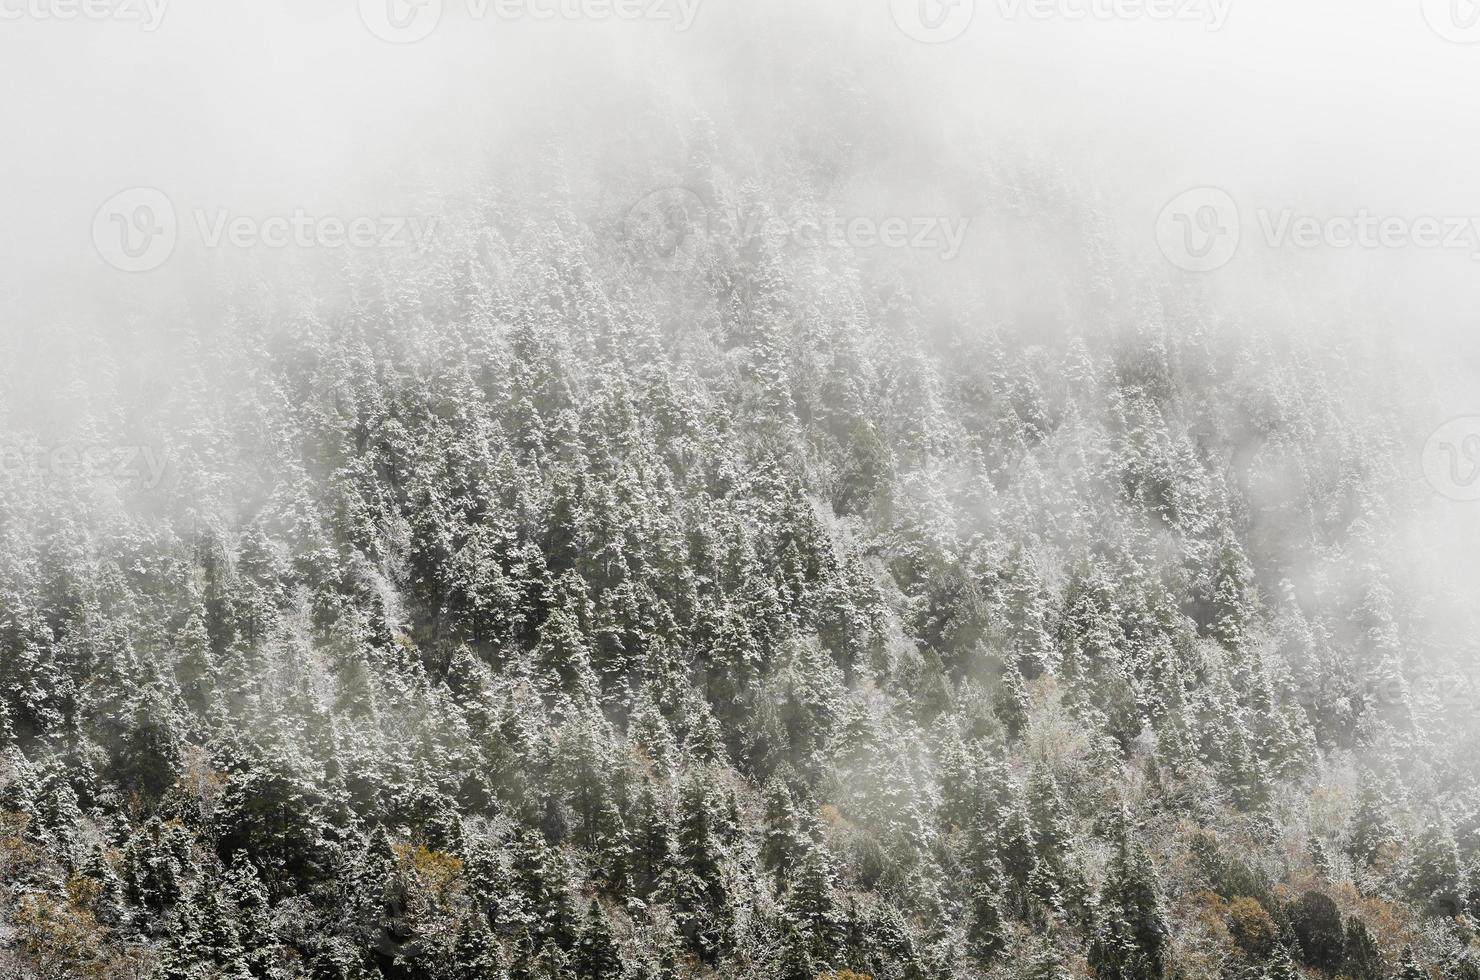 Hochgebirgswald, bedeckt von schneebedecktem Raureif. huanglong, ch foto